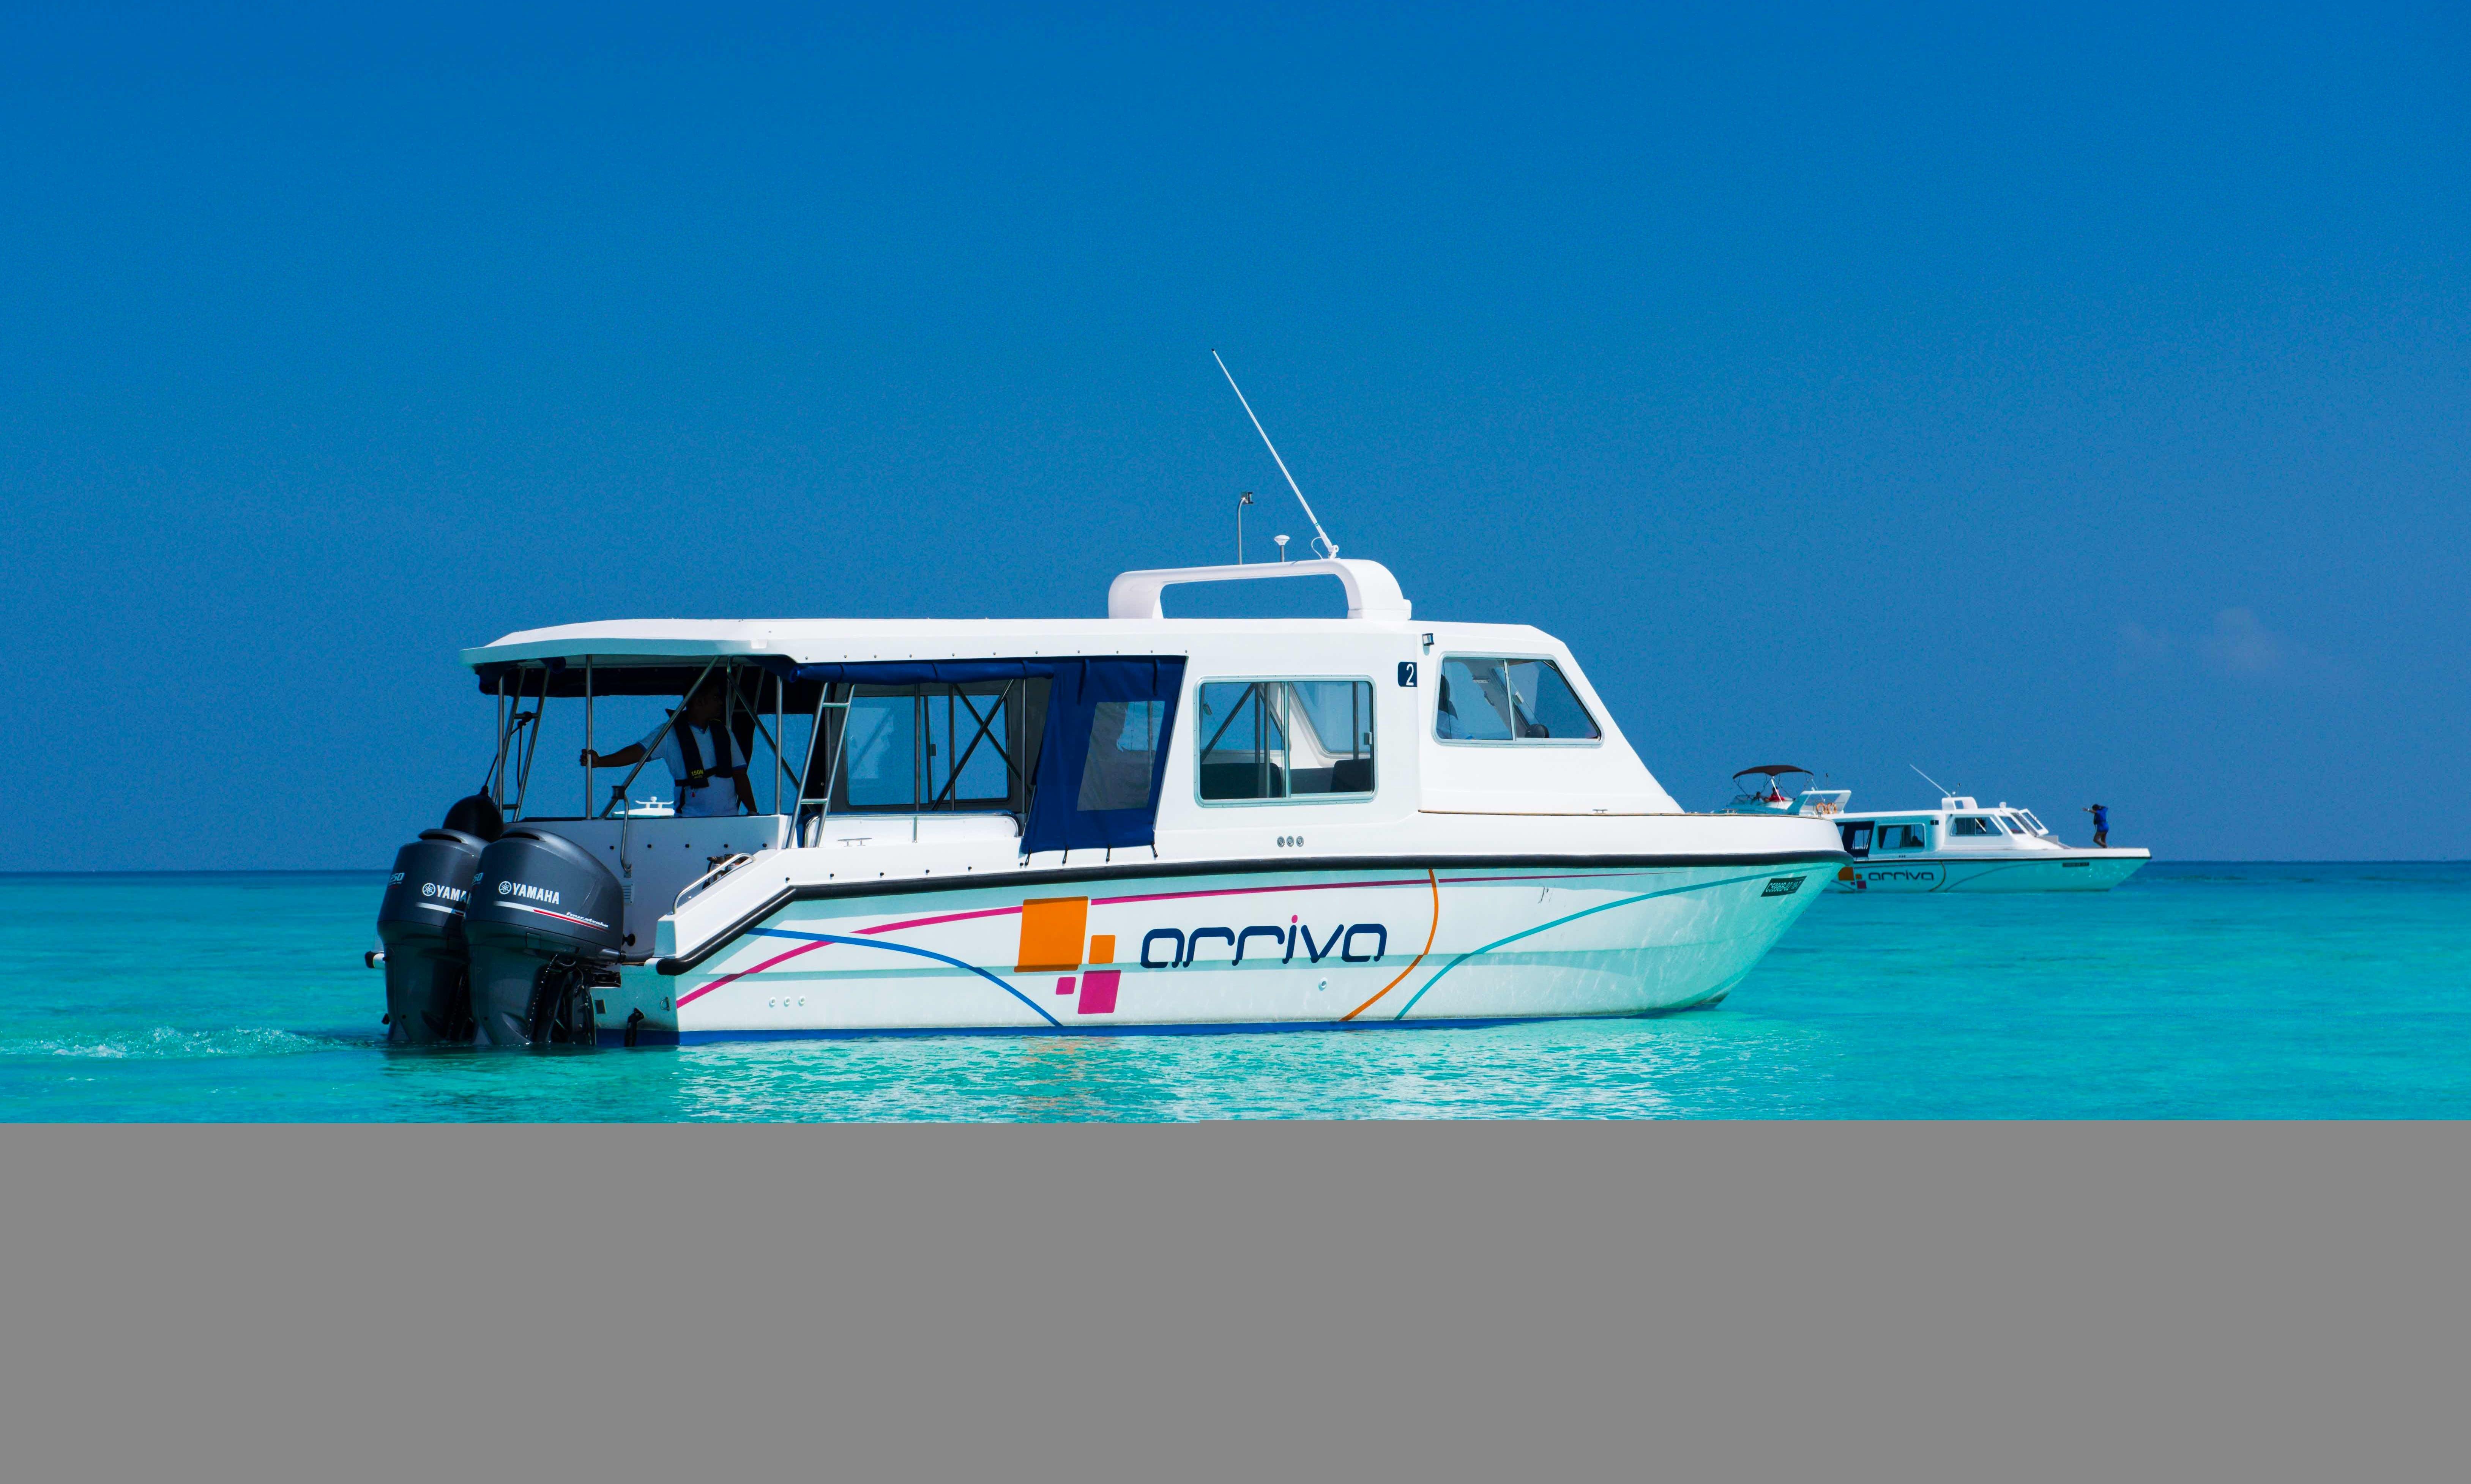 Enjoy Whale Watching Tour in Malé, Maldives on Cuddy Cabin